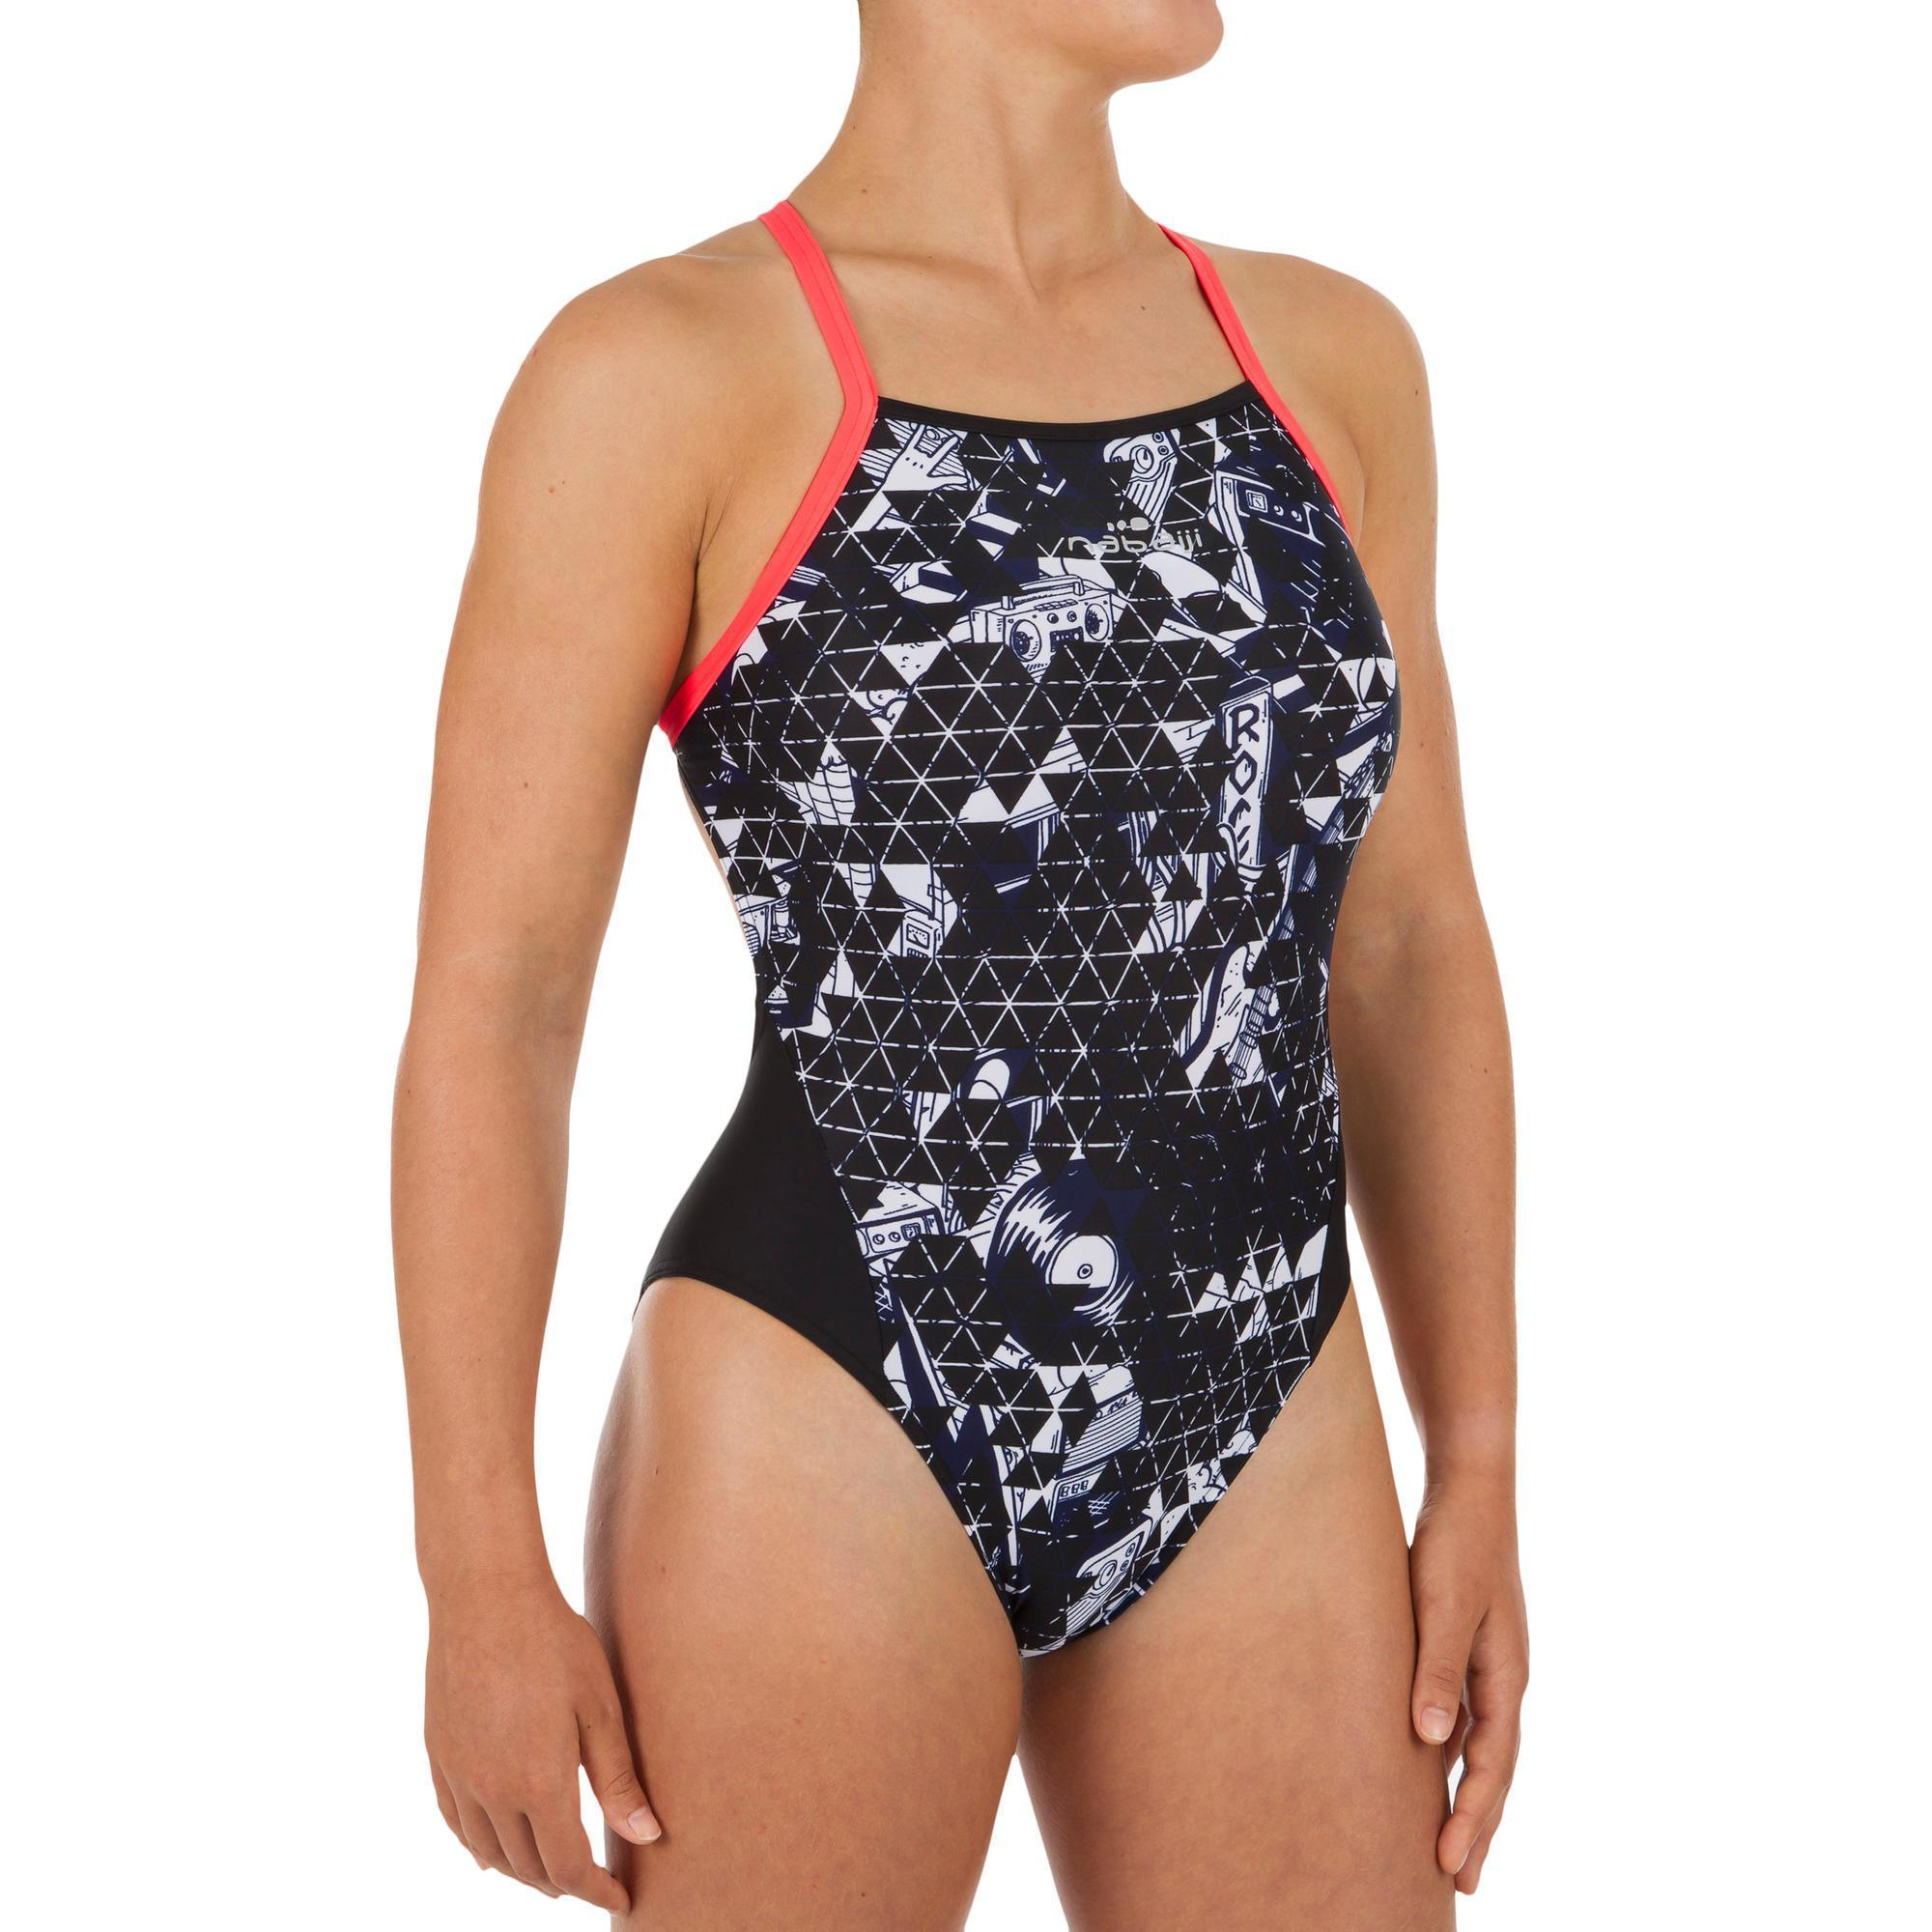 b293dafad510 Black and white women s Lexa rocki one-piece swimsuit